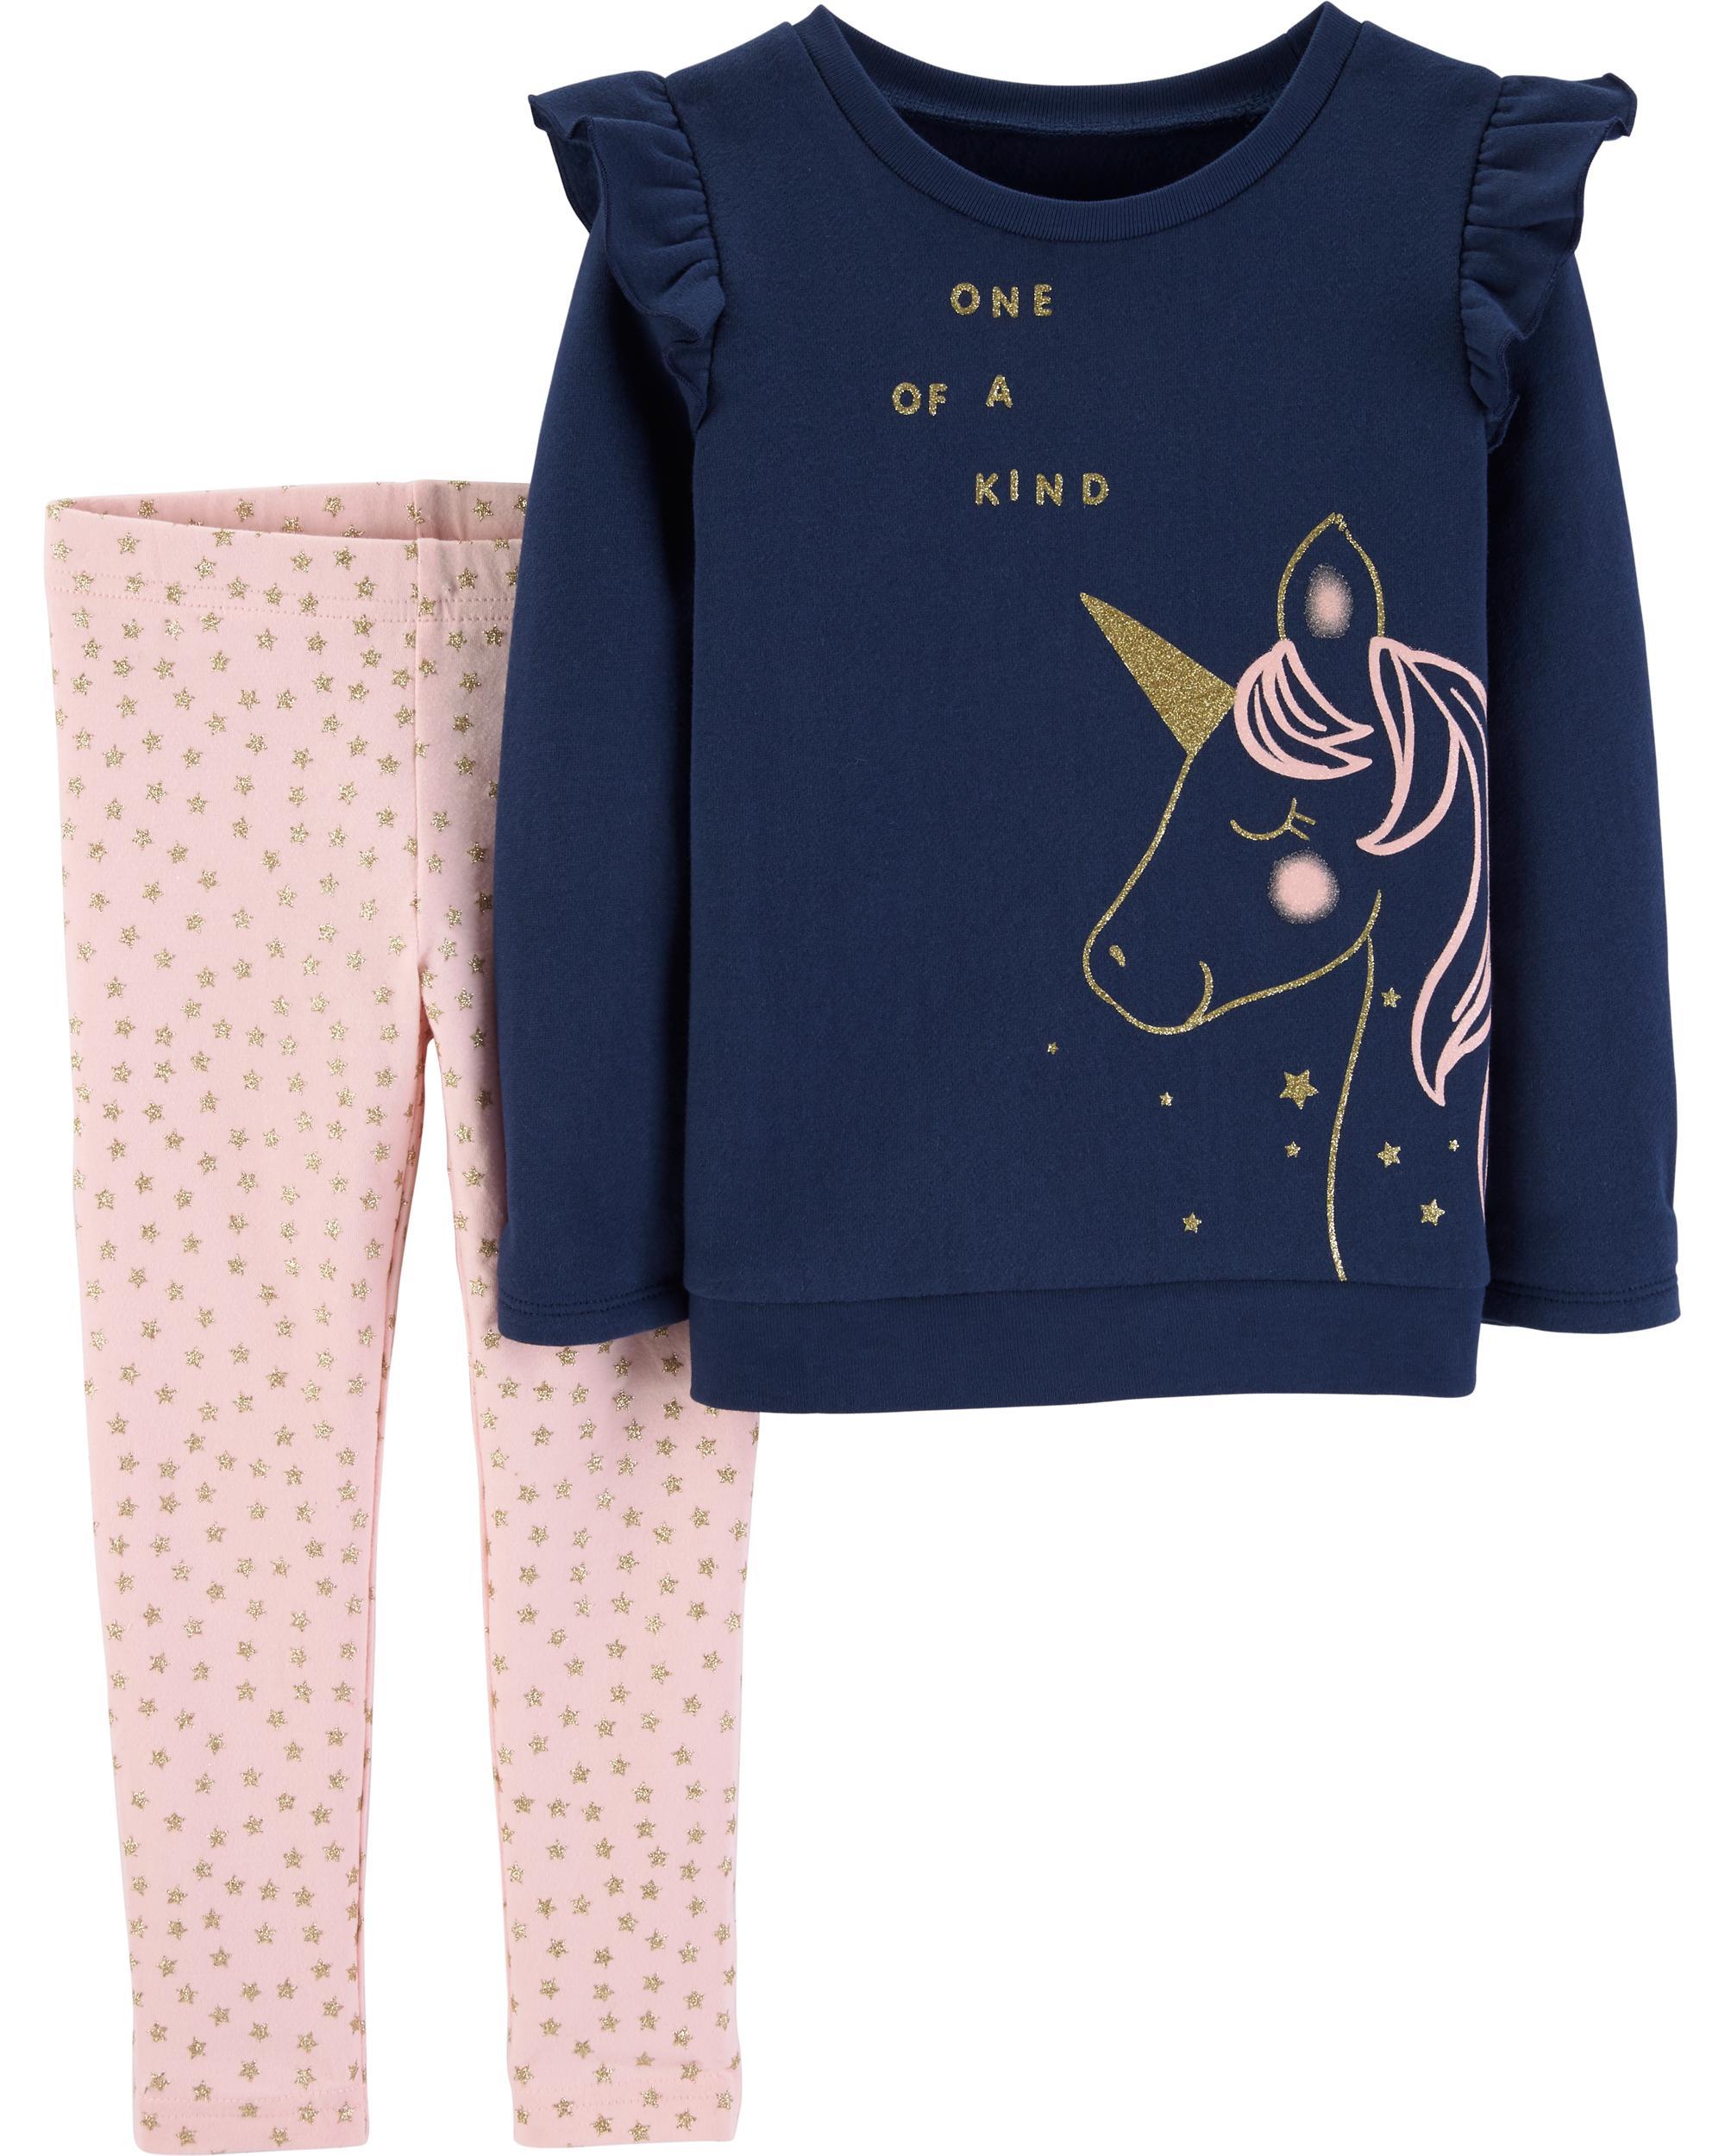 Fineser Toddler Little Boys Girls Cartoon Whale Long Sleeve T-Shirts+Pants Legging 2Pcs Clothes Set